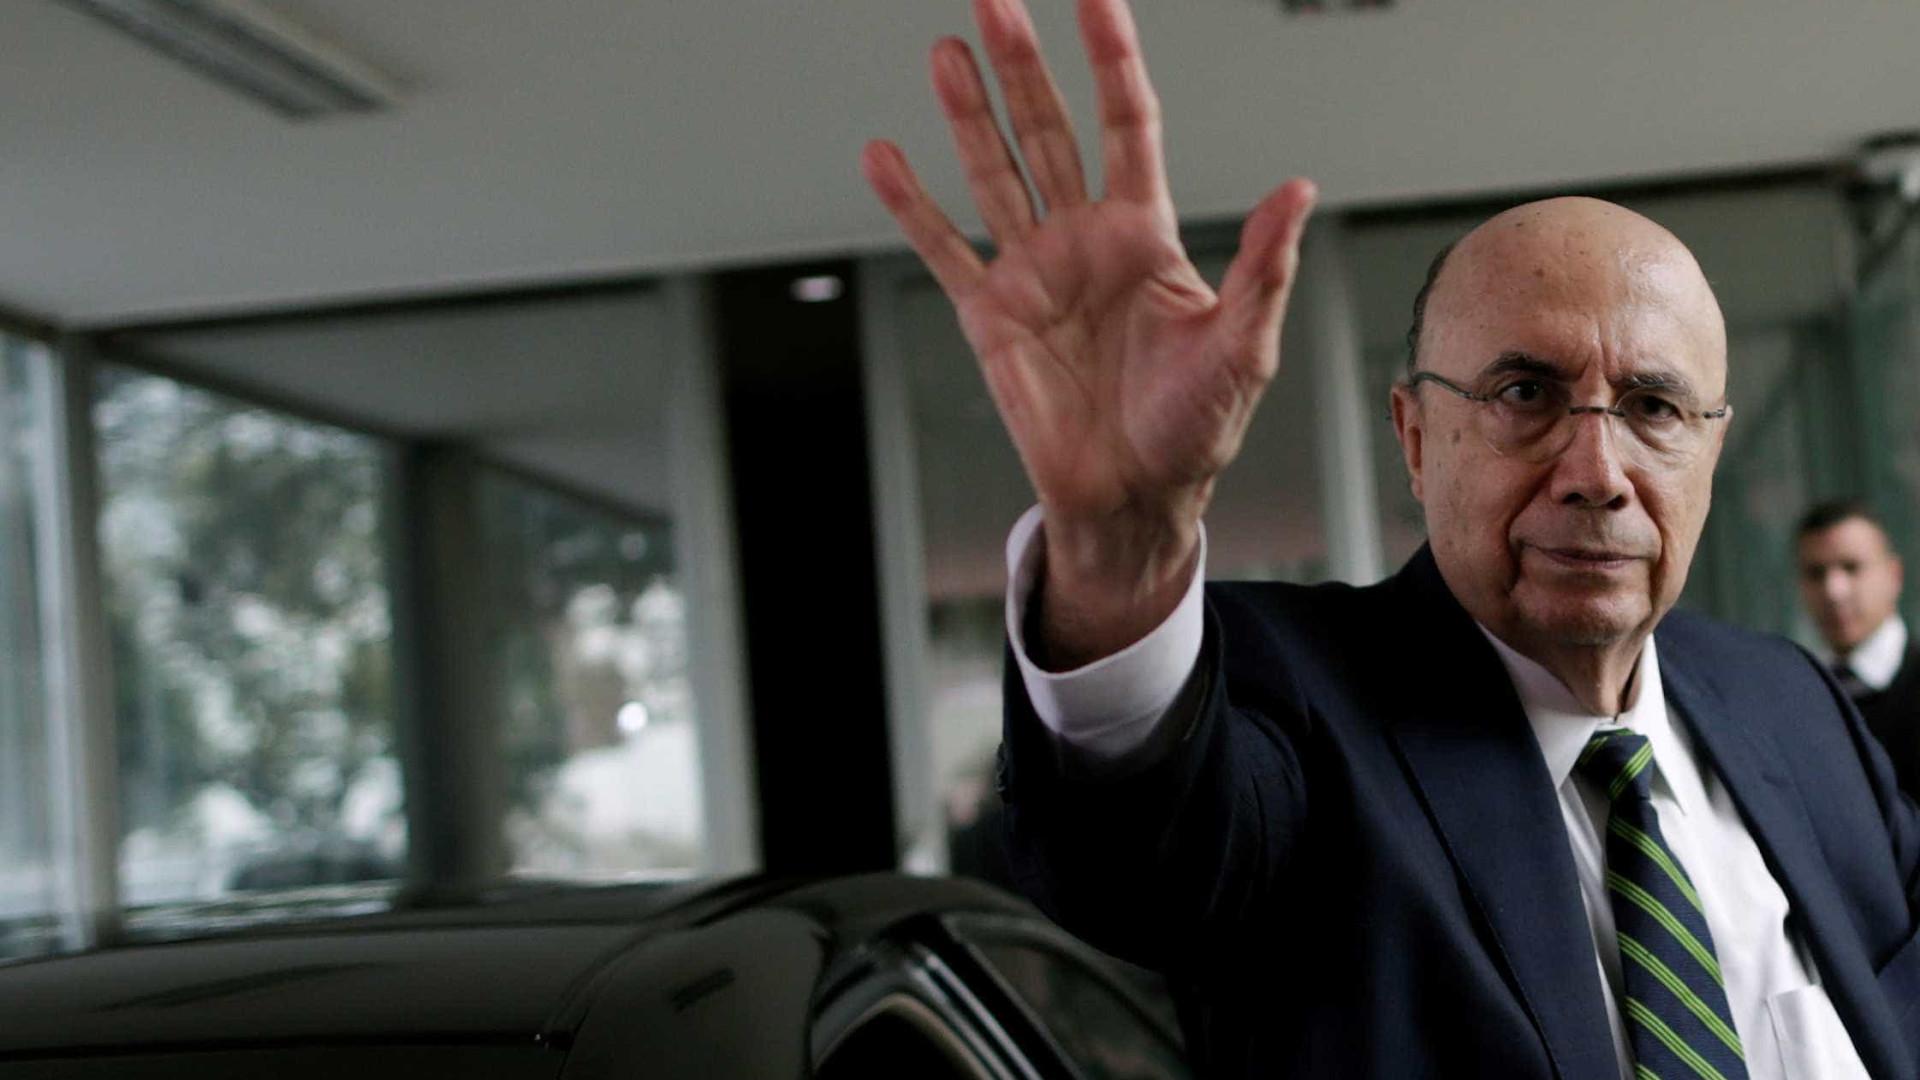 Economista questiona: queda de Dilma  foi ordenada por Wall Street?